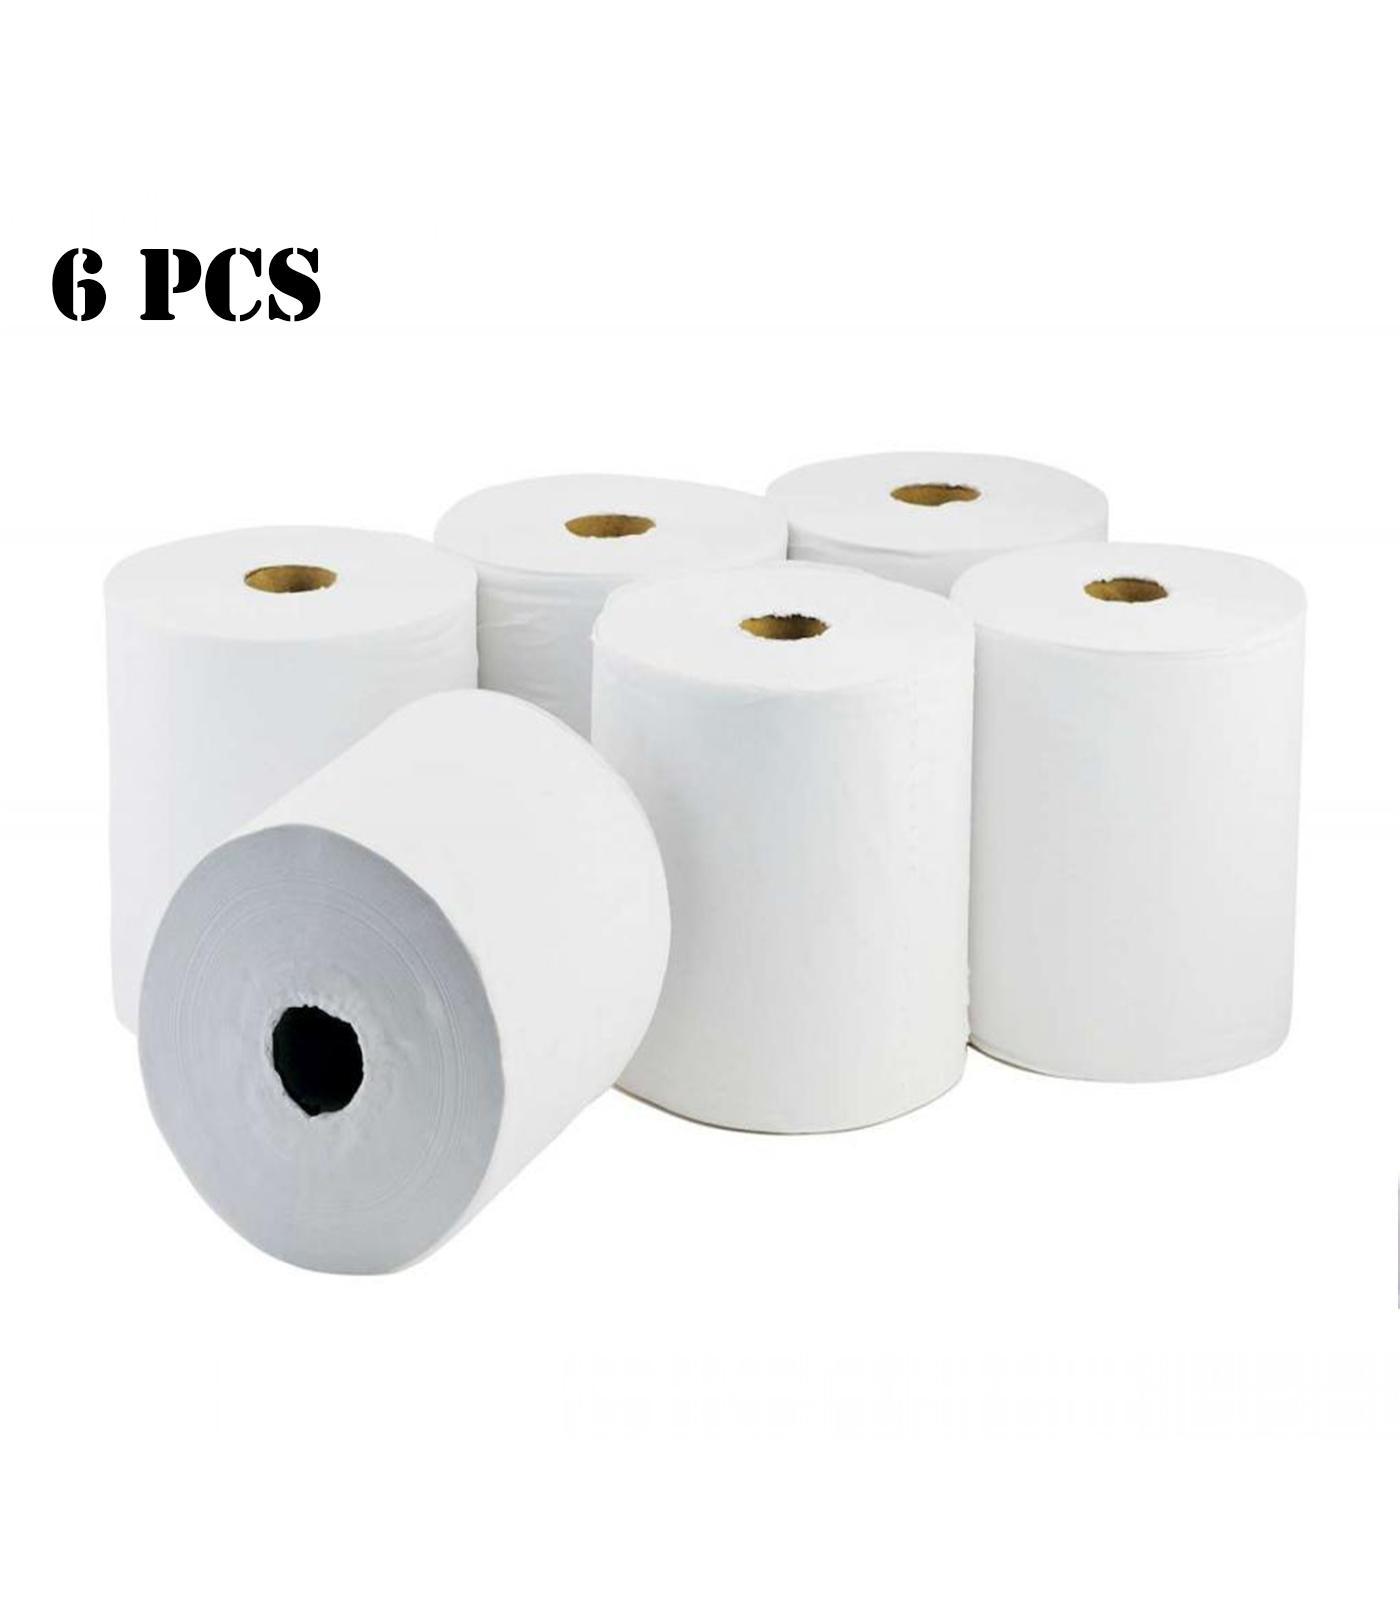 most absorbent paper towel